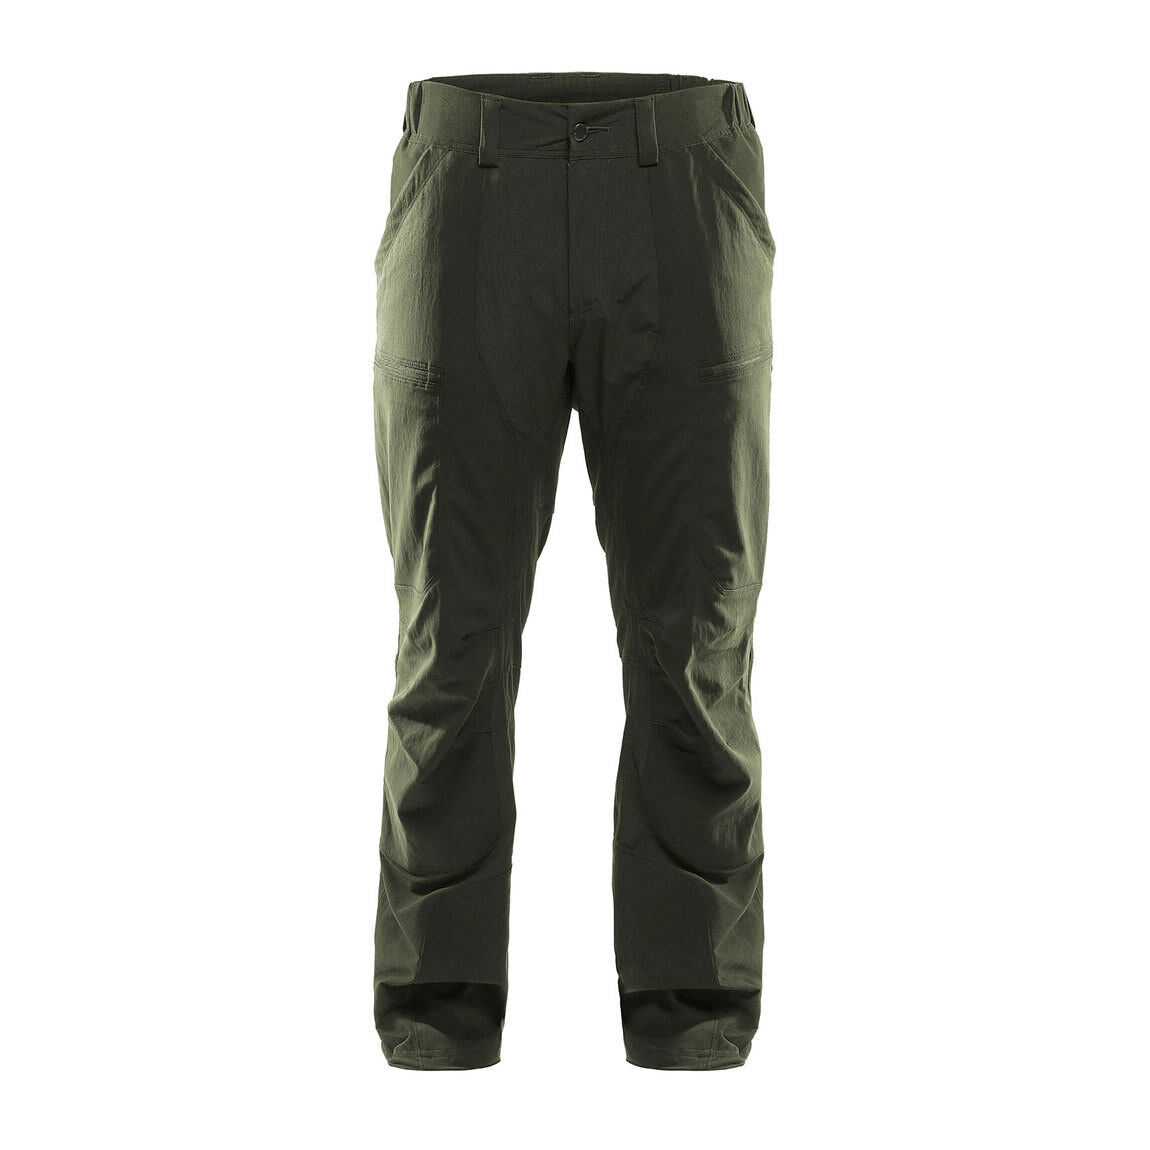 Haglofs Resistente Fjell Pantalones para hombre Tamaño  pequeño hagloff